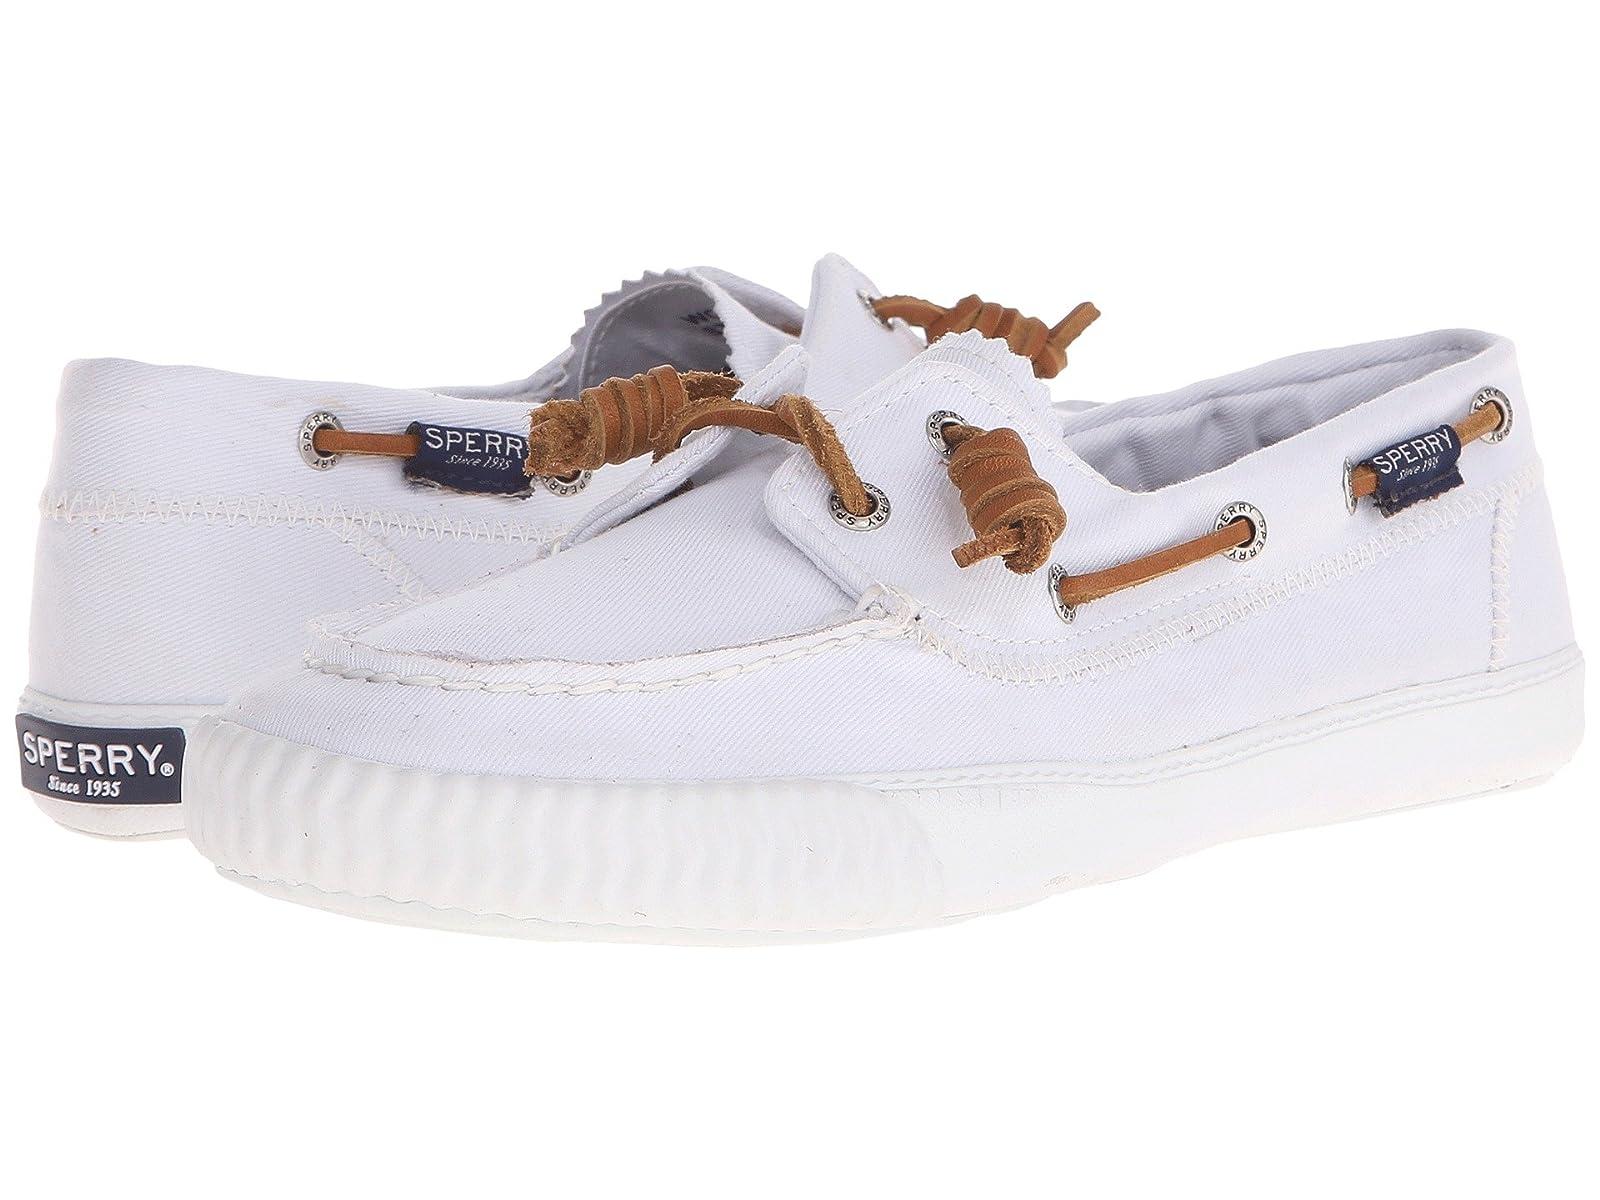 Sperry Sayel Away WashedSelling fashionable and eye-catching shoes